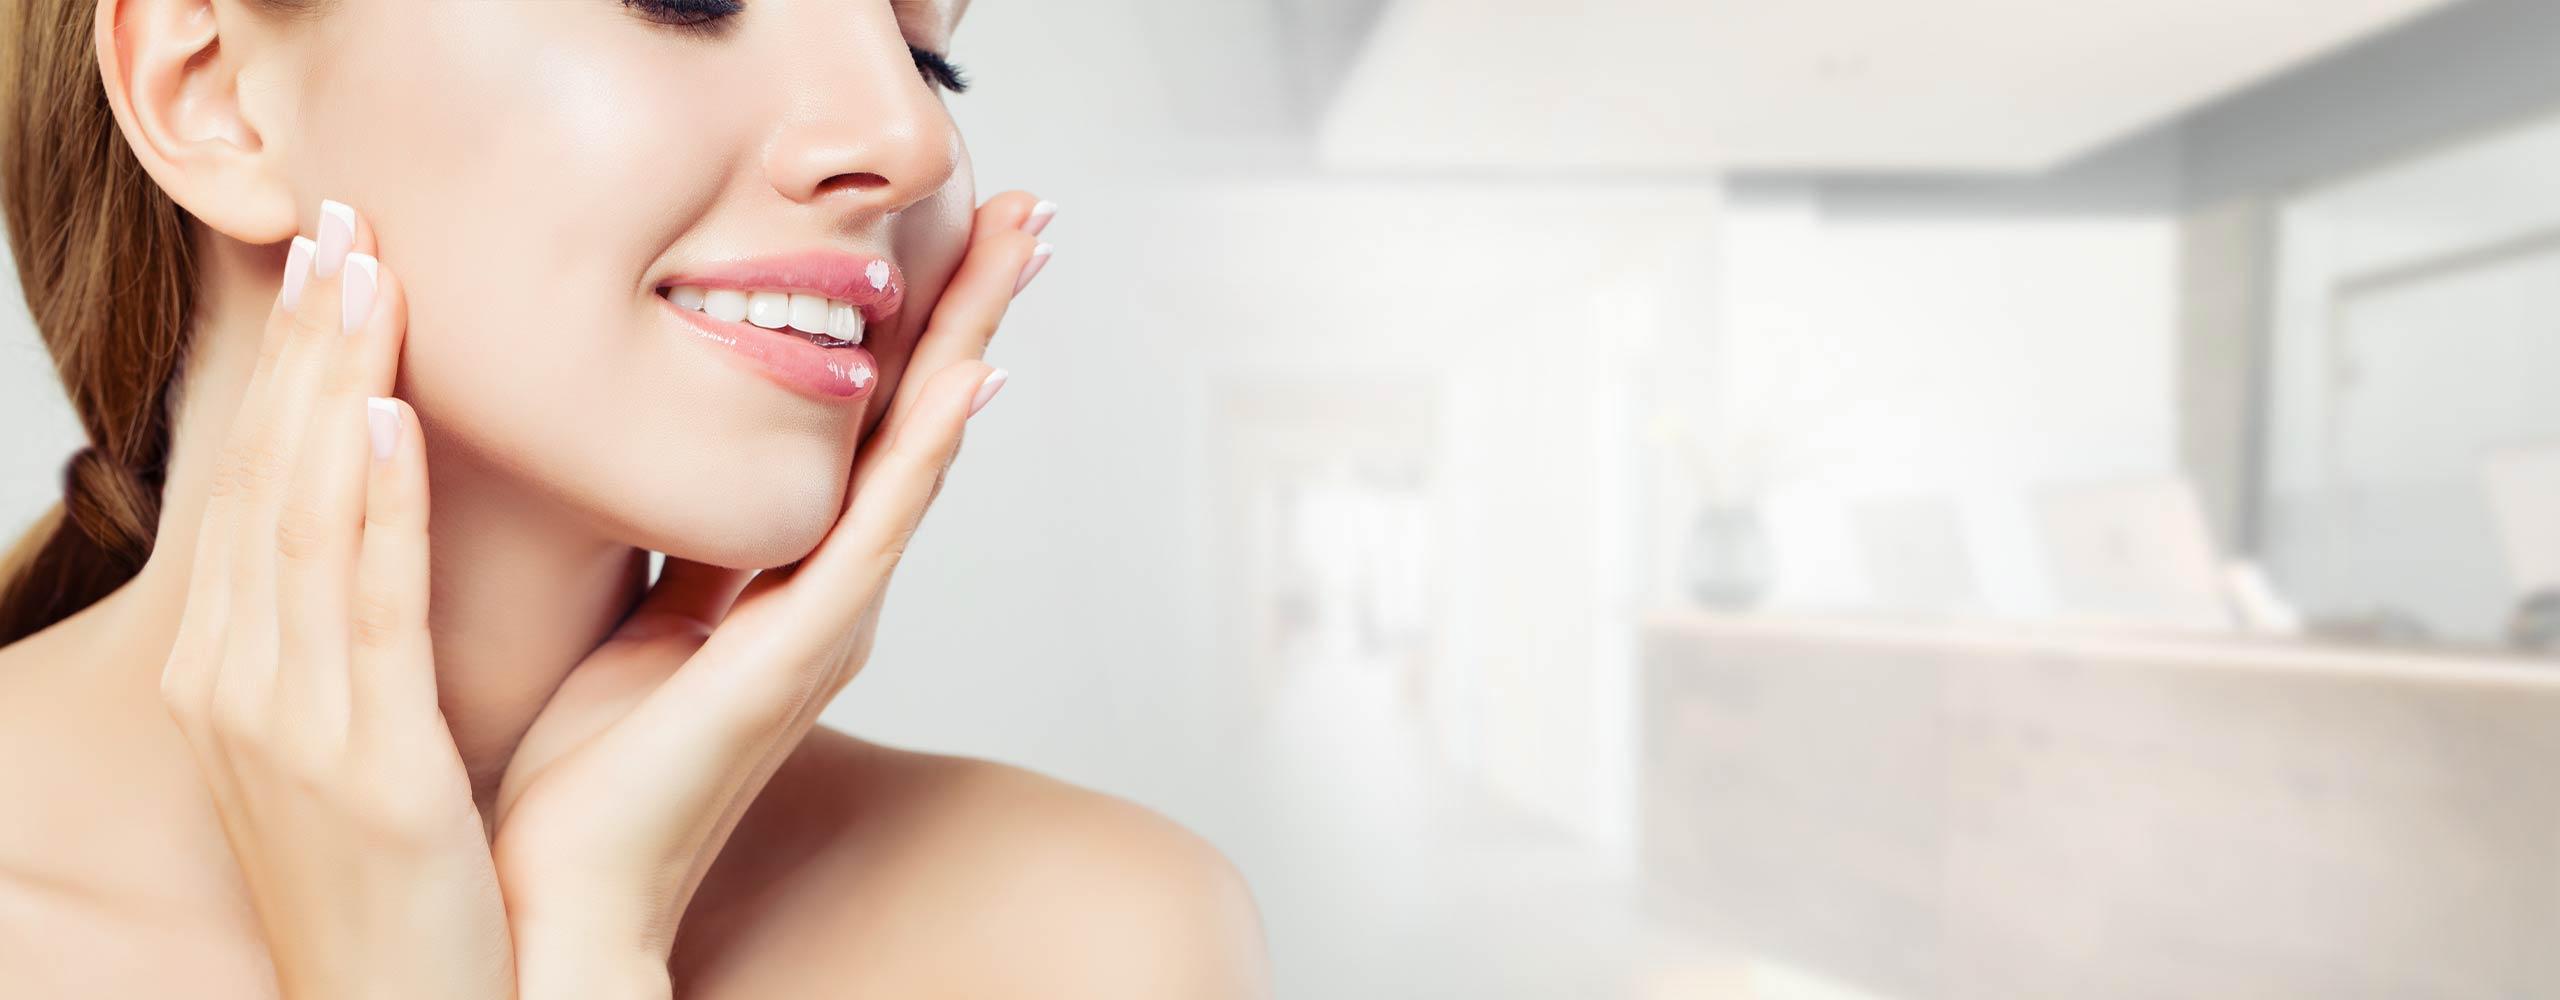 zahnarztpraxis heidelberg bleaching schoenheitsklinik proaesthetic header